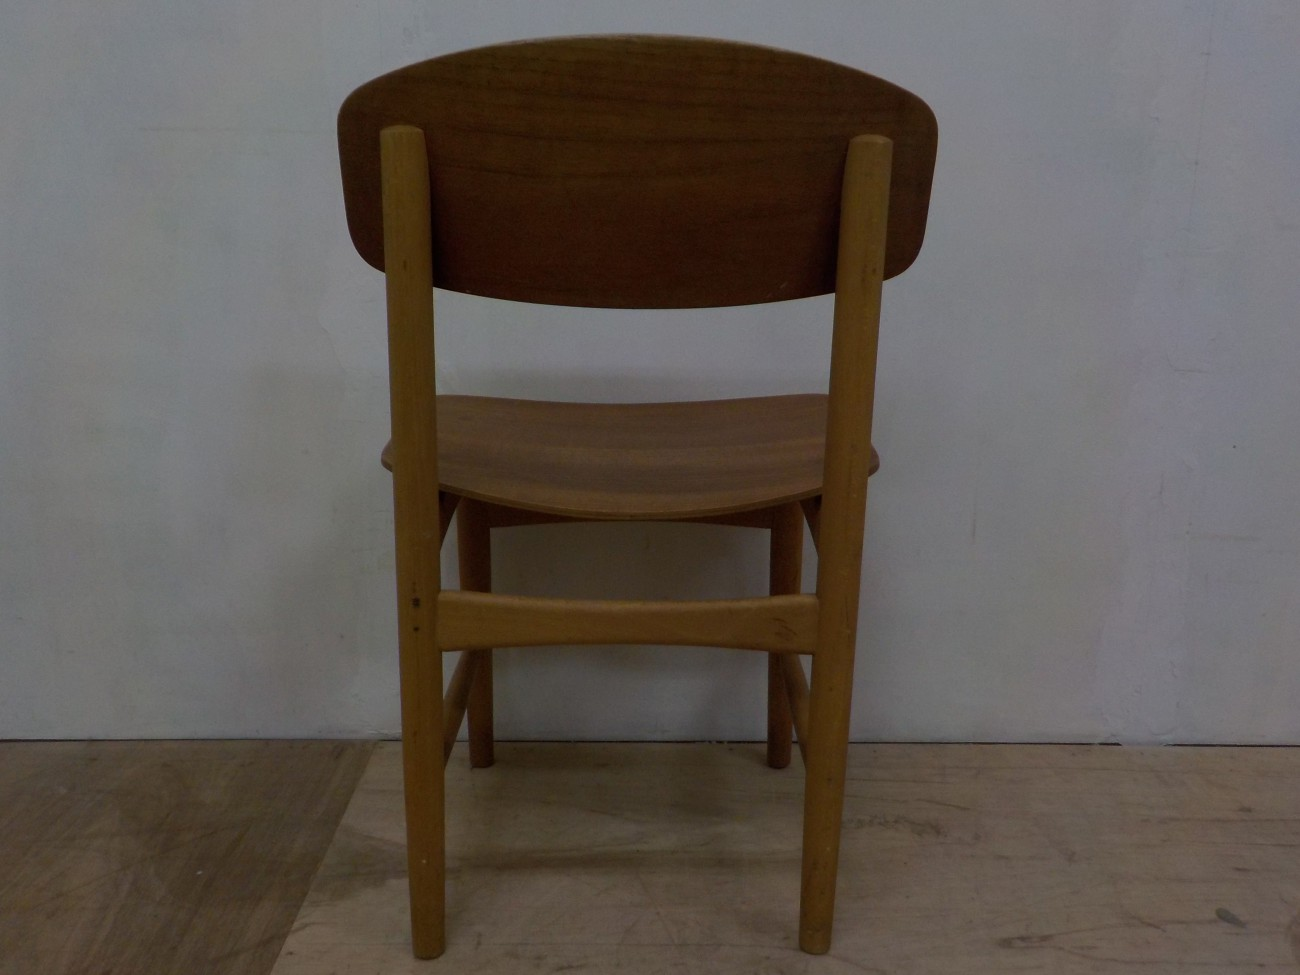 DSCN1Borge Mogensen model122 Dining Chair / チークxビーチ ボーエ・モーエンセン ダイニングチェア / stock2012-33-(2)039